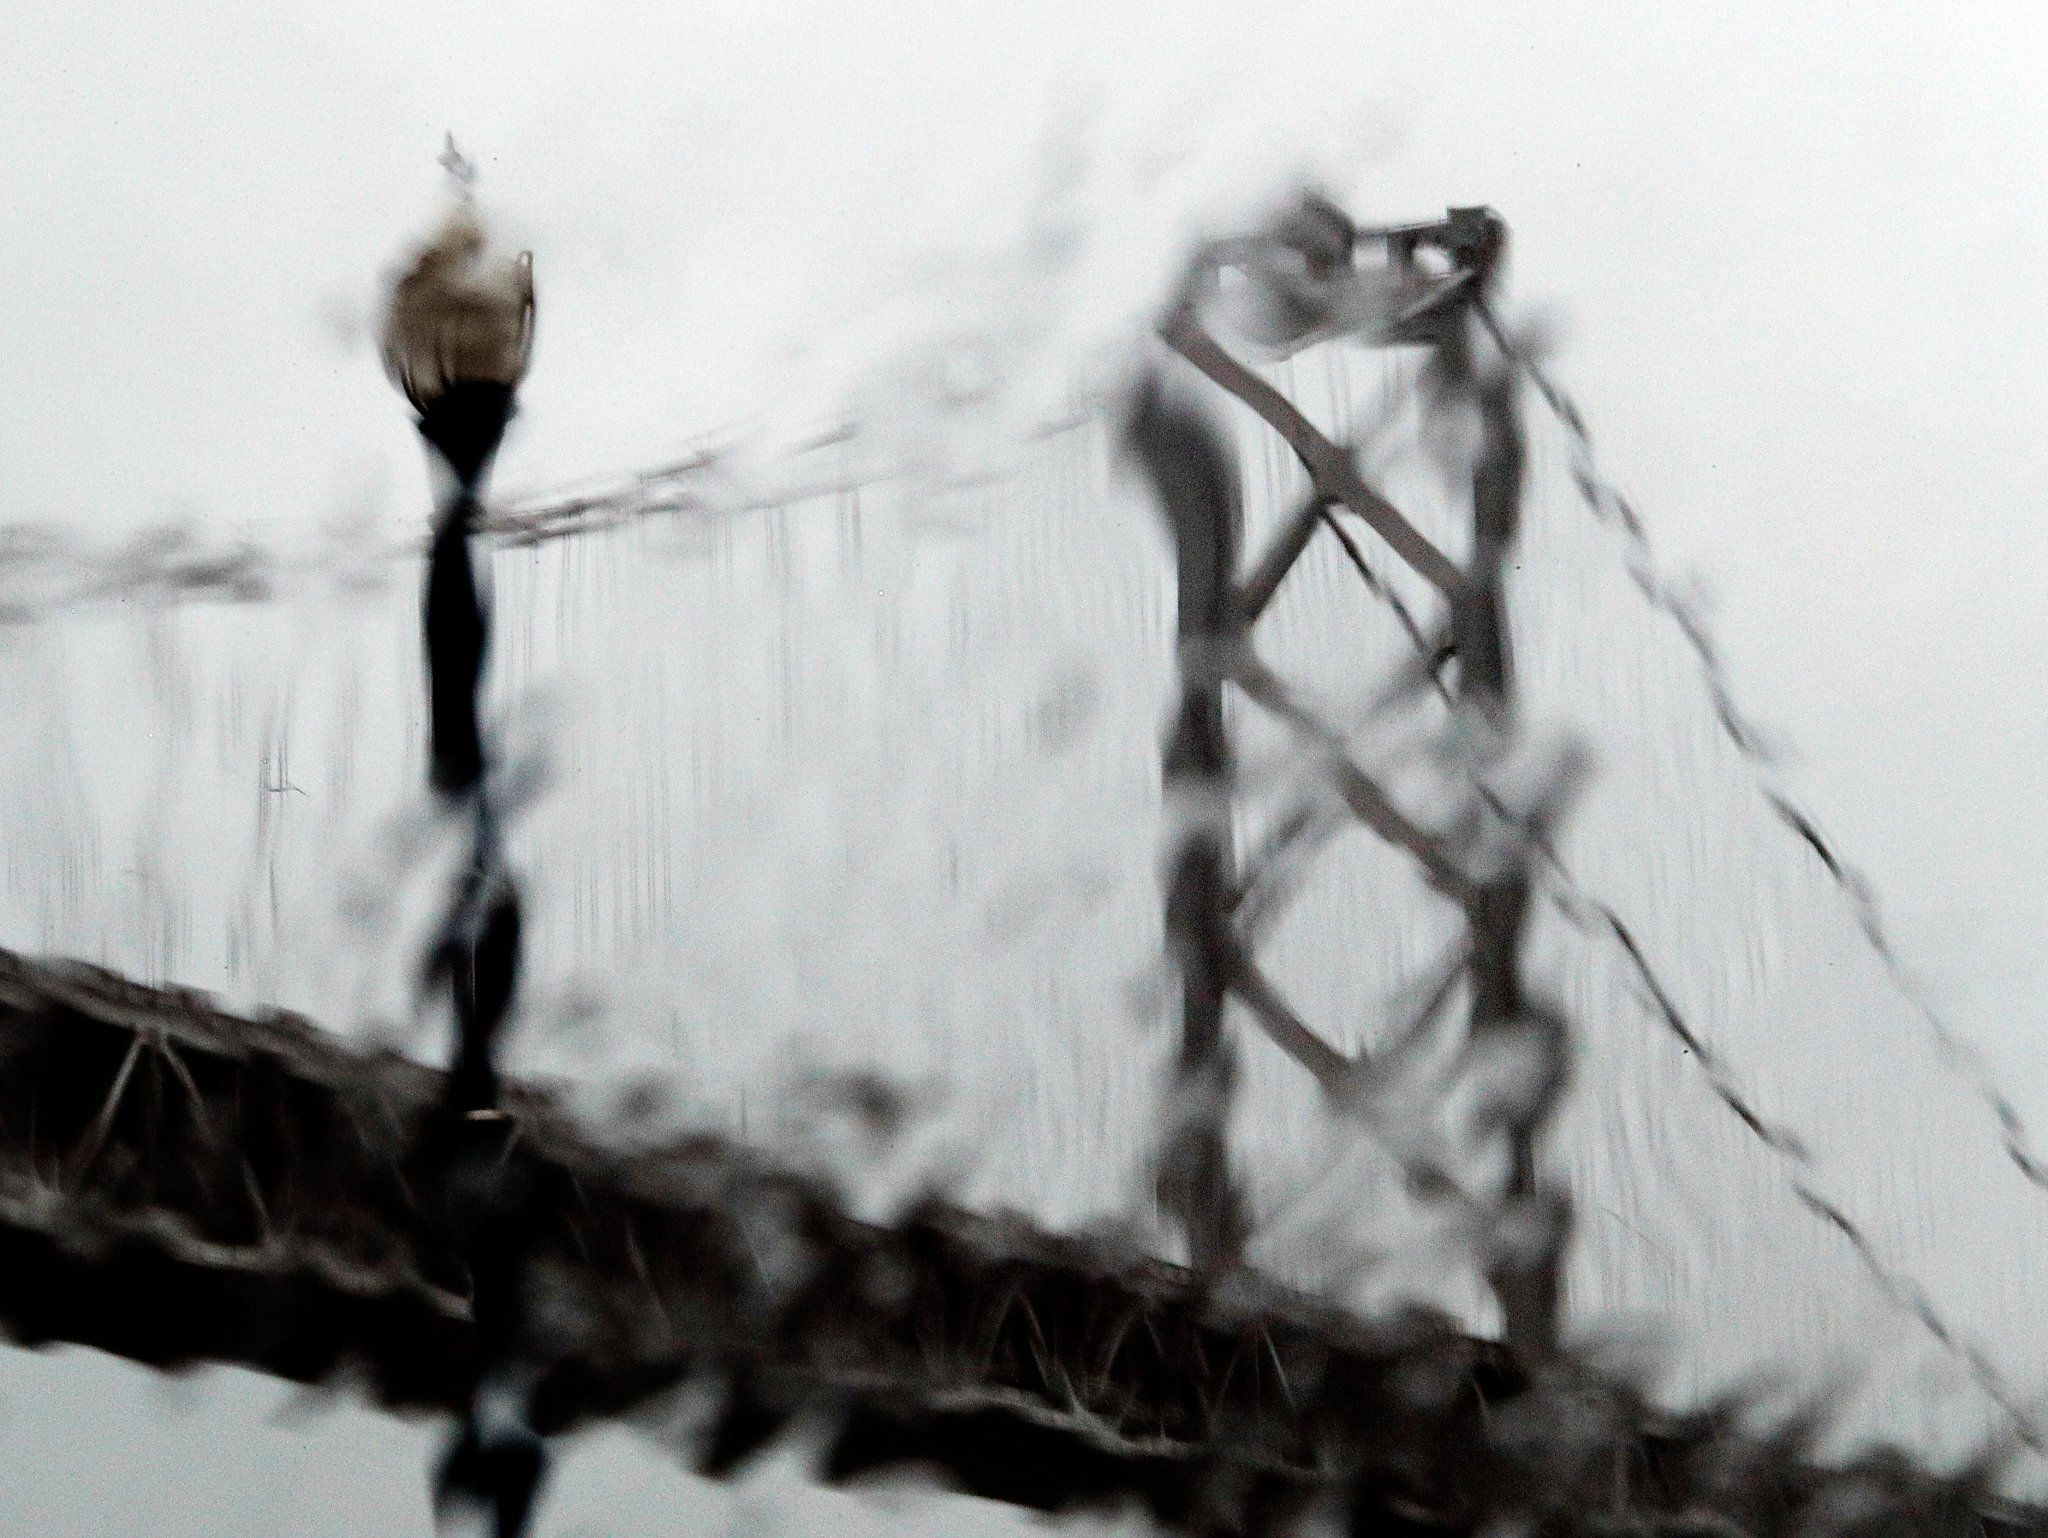 Storm system moves on Bay Area, heavy rain expected Sunday